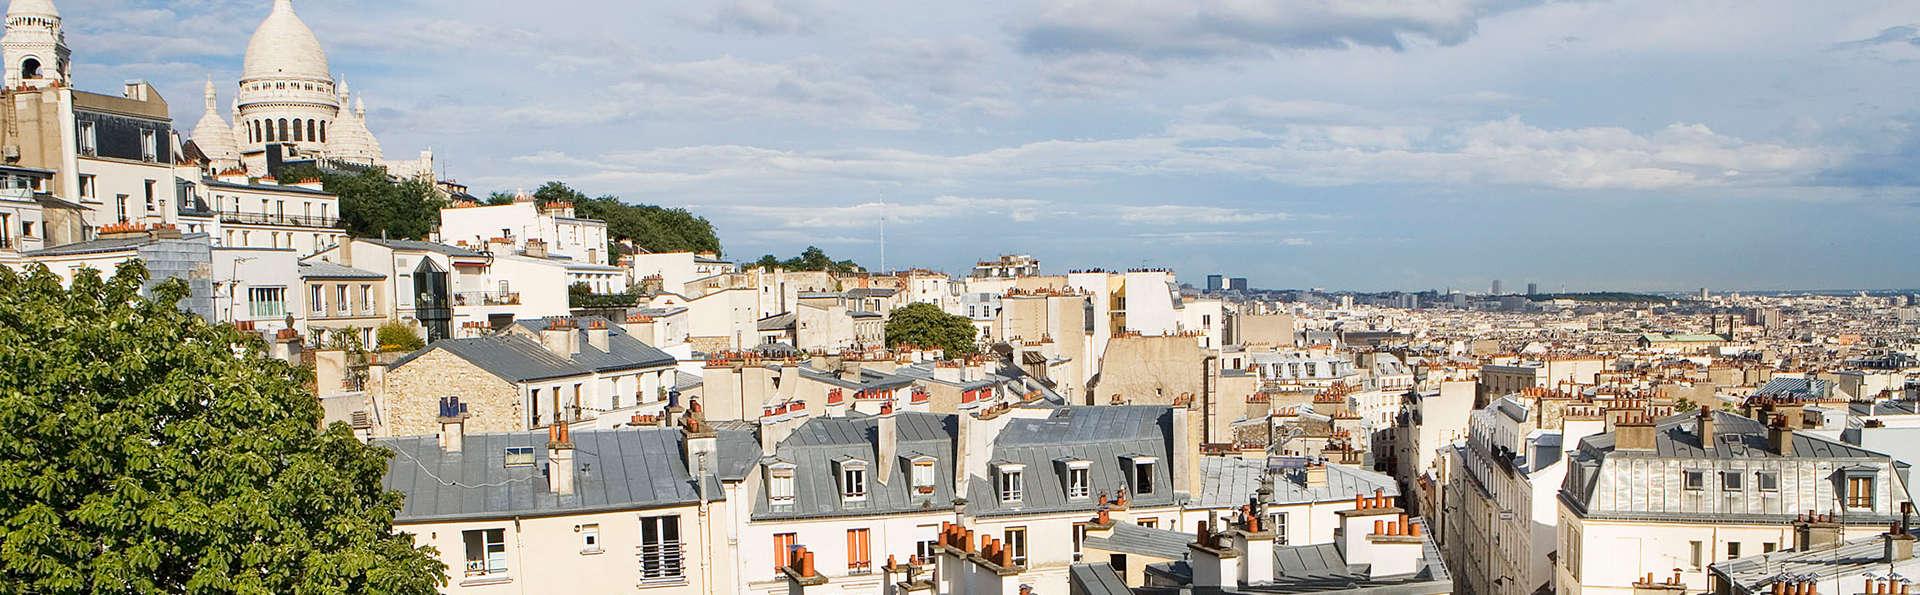 Timhotel Montmartre - EDIT_view2.jpg